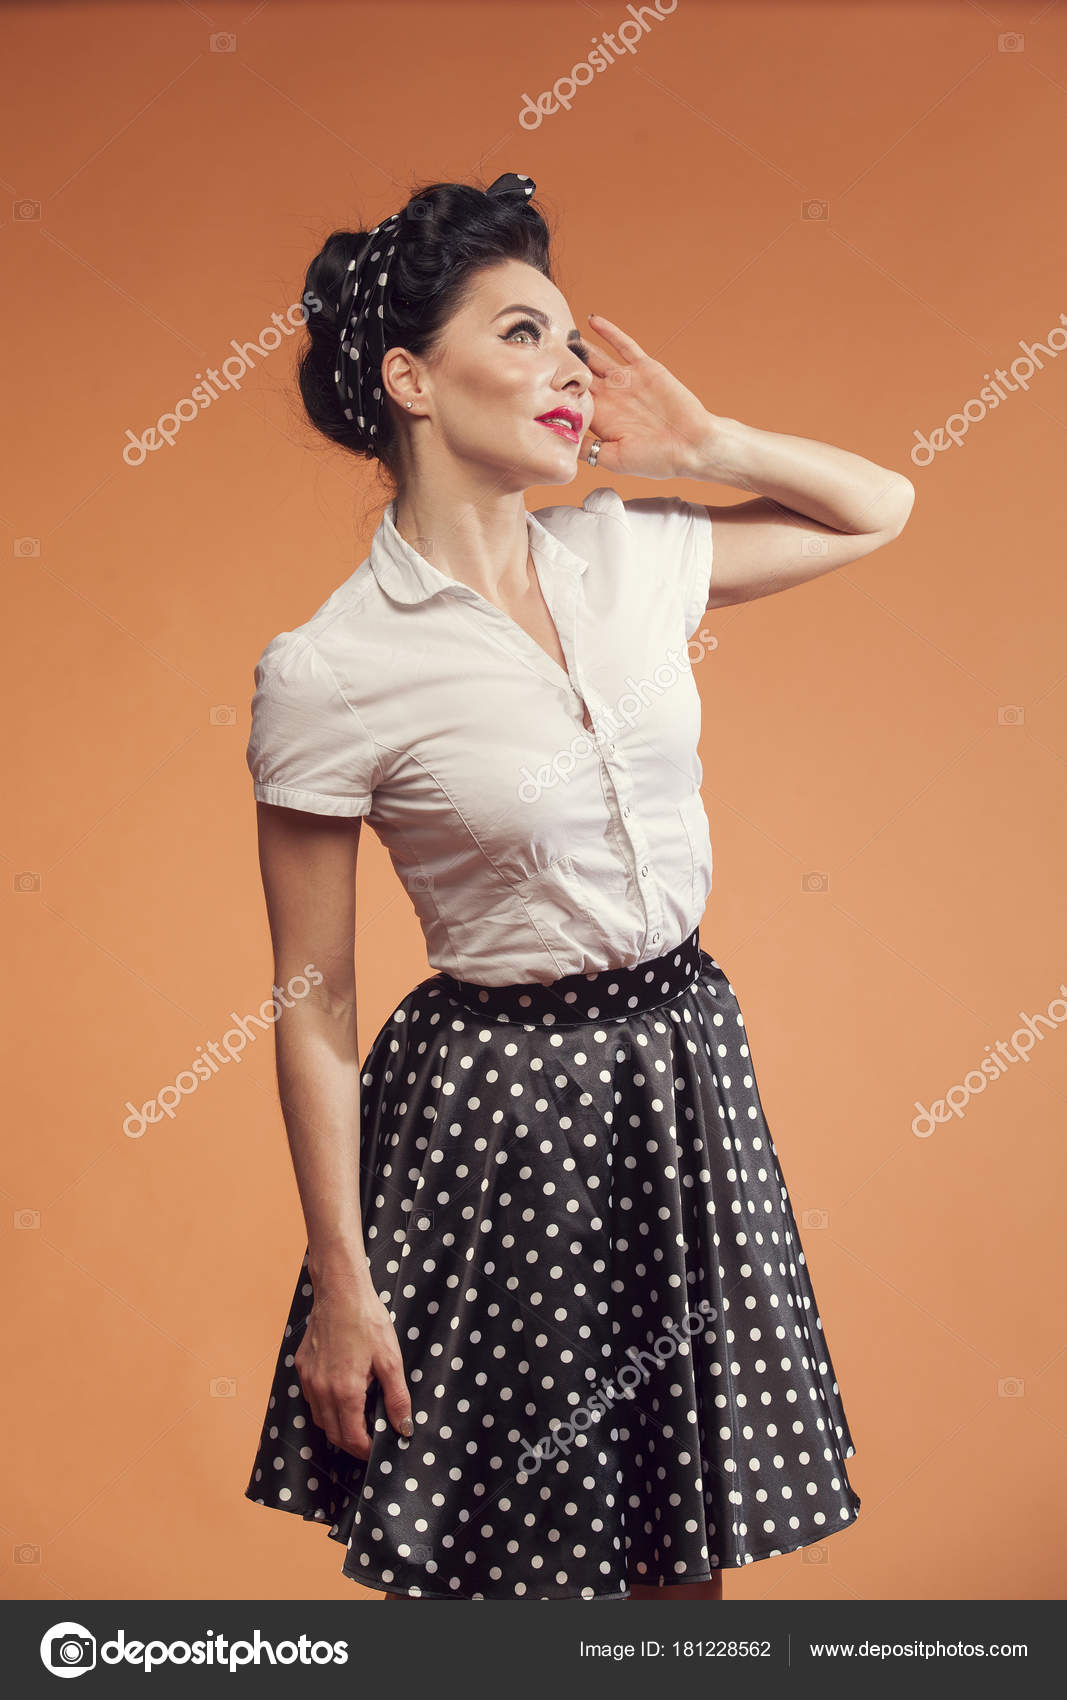 5b6cfa5c9a935b Jeune Femme Jupe Pois Sur Fond Orange — Photographie sigma1850 ...